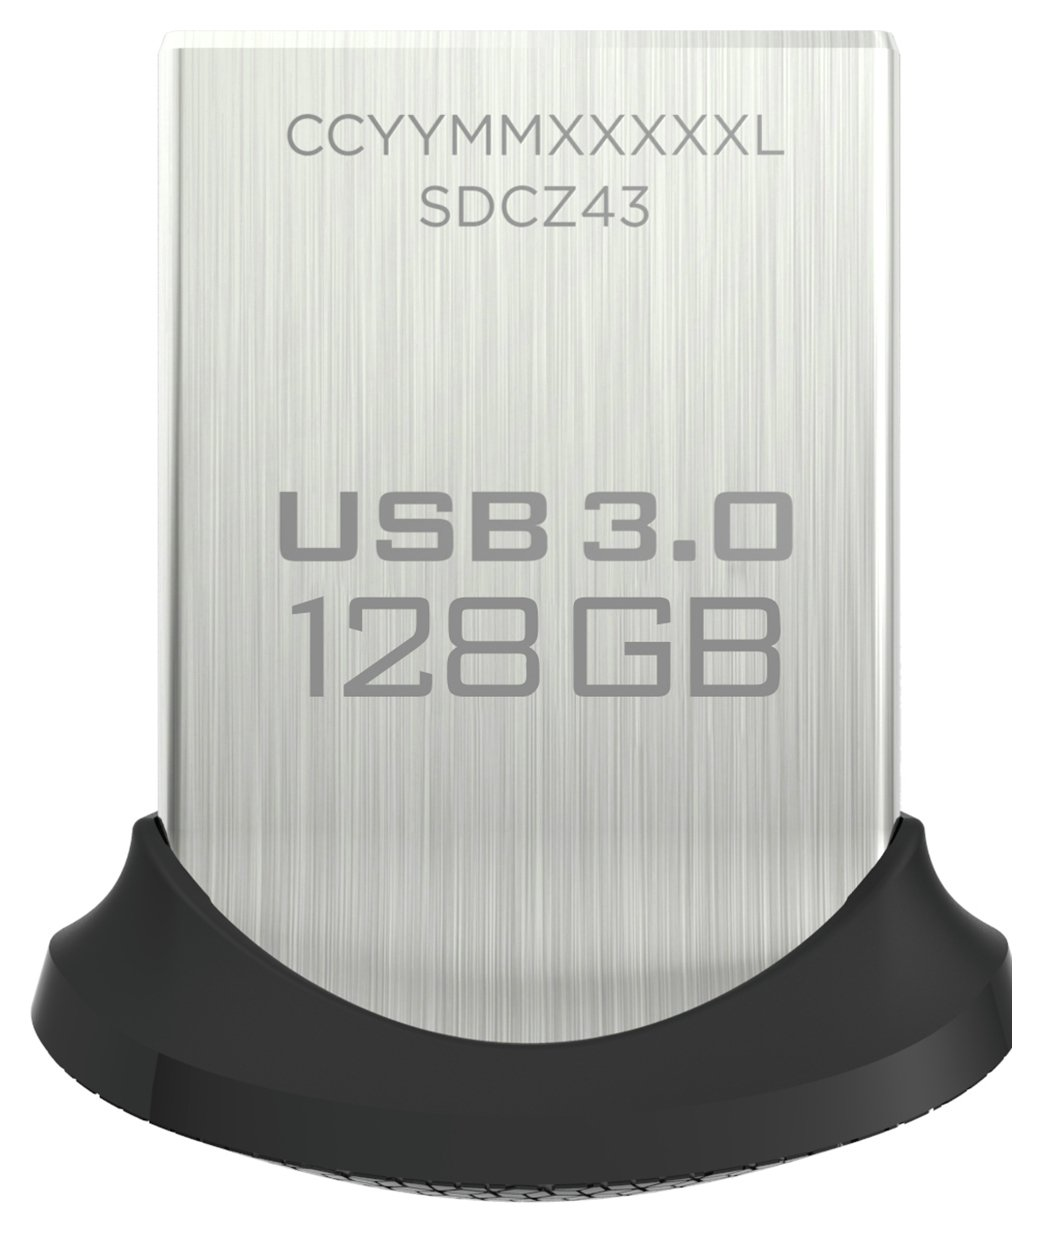 SanDisk SanDisk Ultra Fit 150MB/s USB 3.0 Flash Drive - 128GB